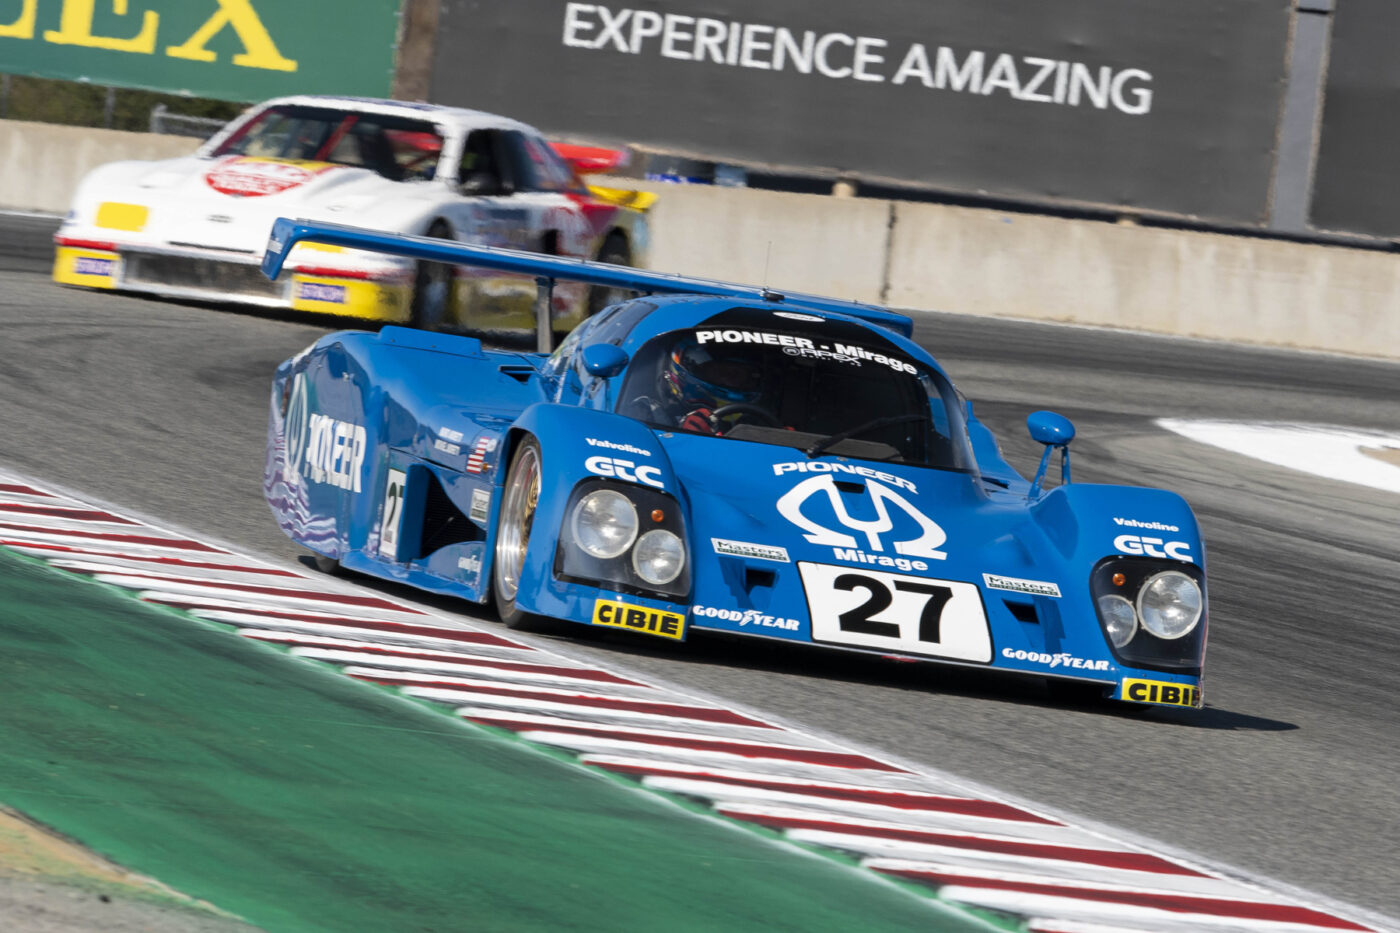 Group 6: FIA Manufacturers Championship - Tom Dooley - 1982 Mirage M12 - ©Rex McAfee